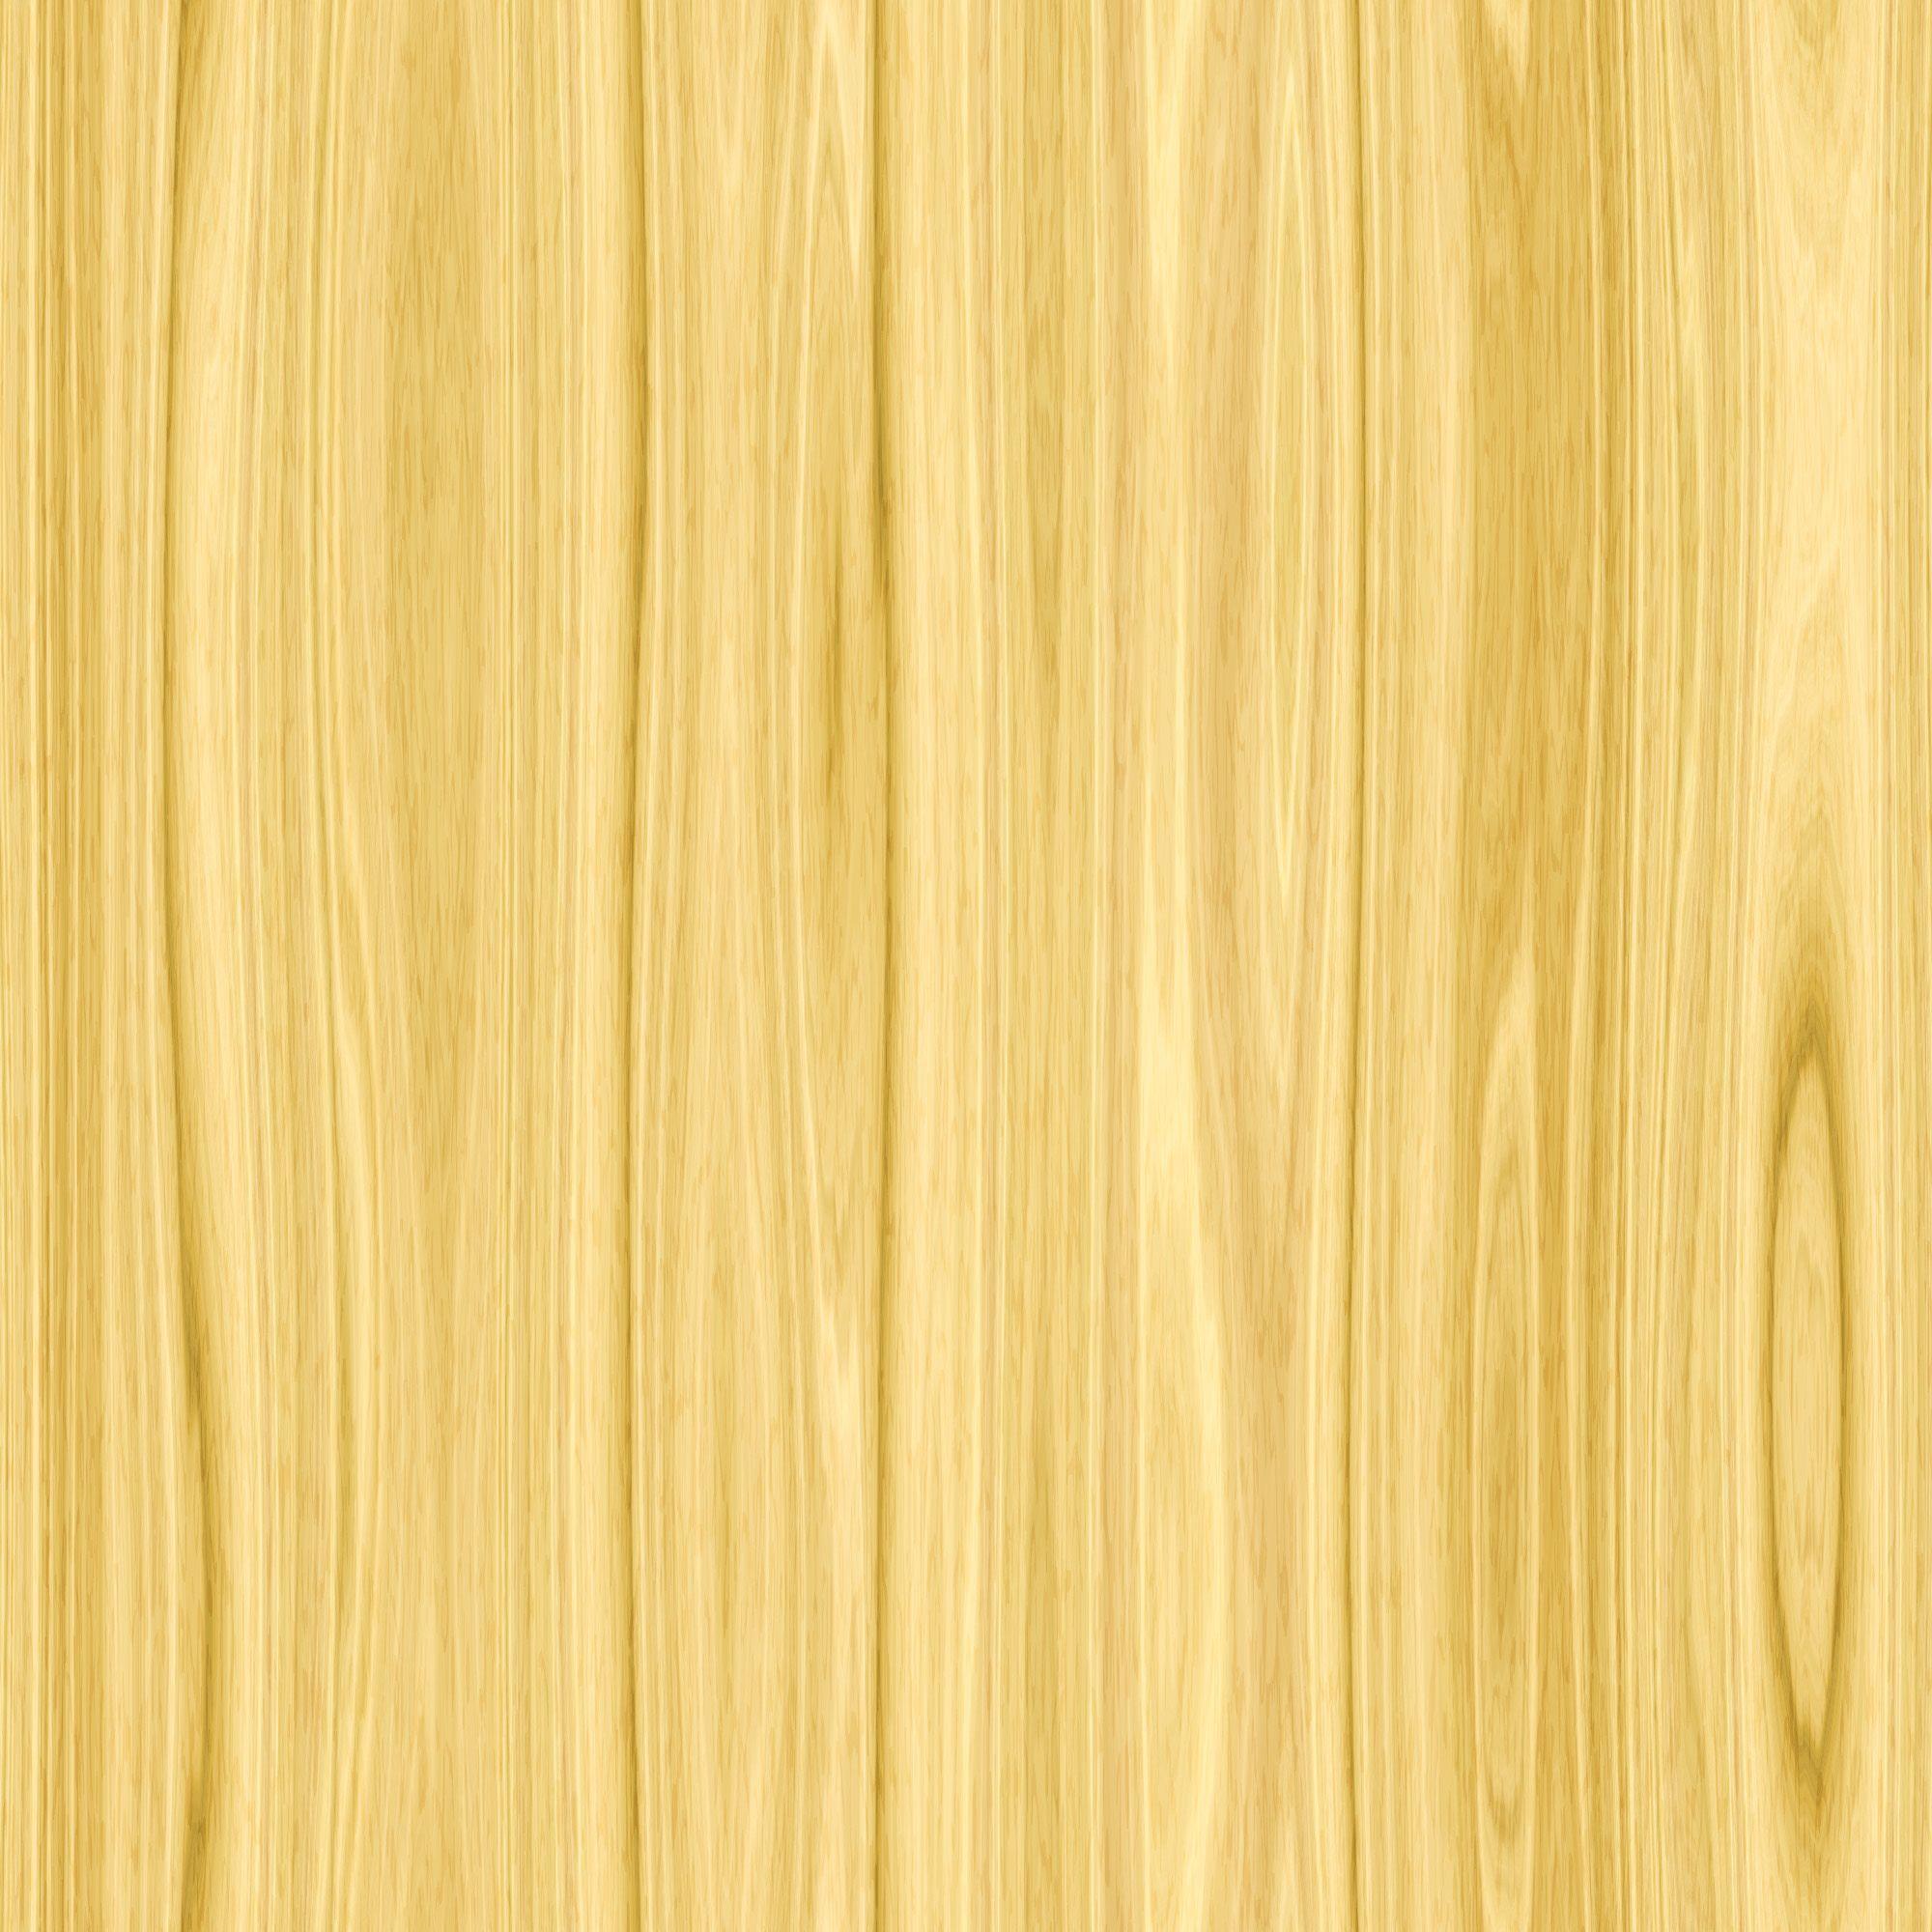 Light Wood Floor Background. seamless wood texture  nice light pine wooden background http www